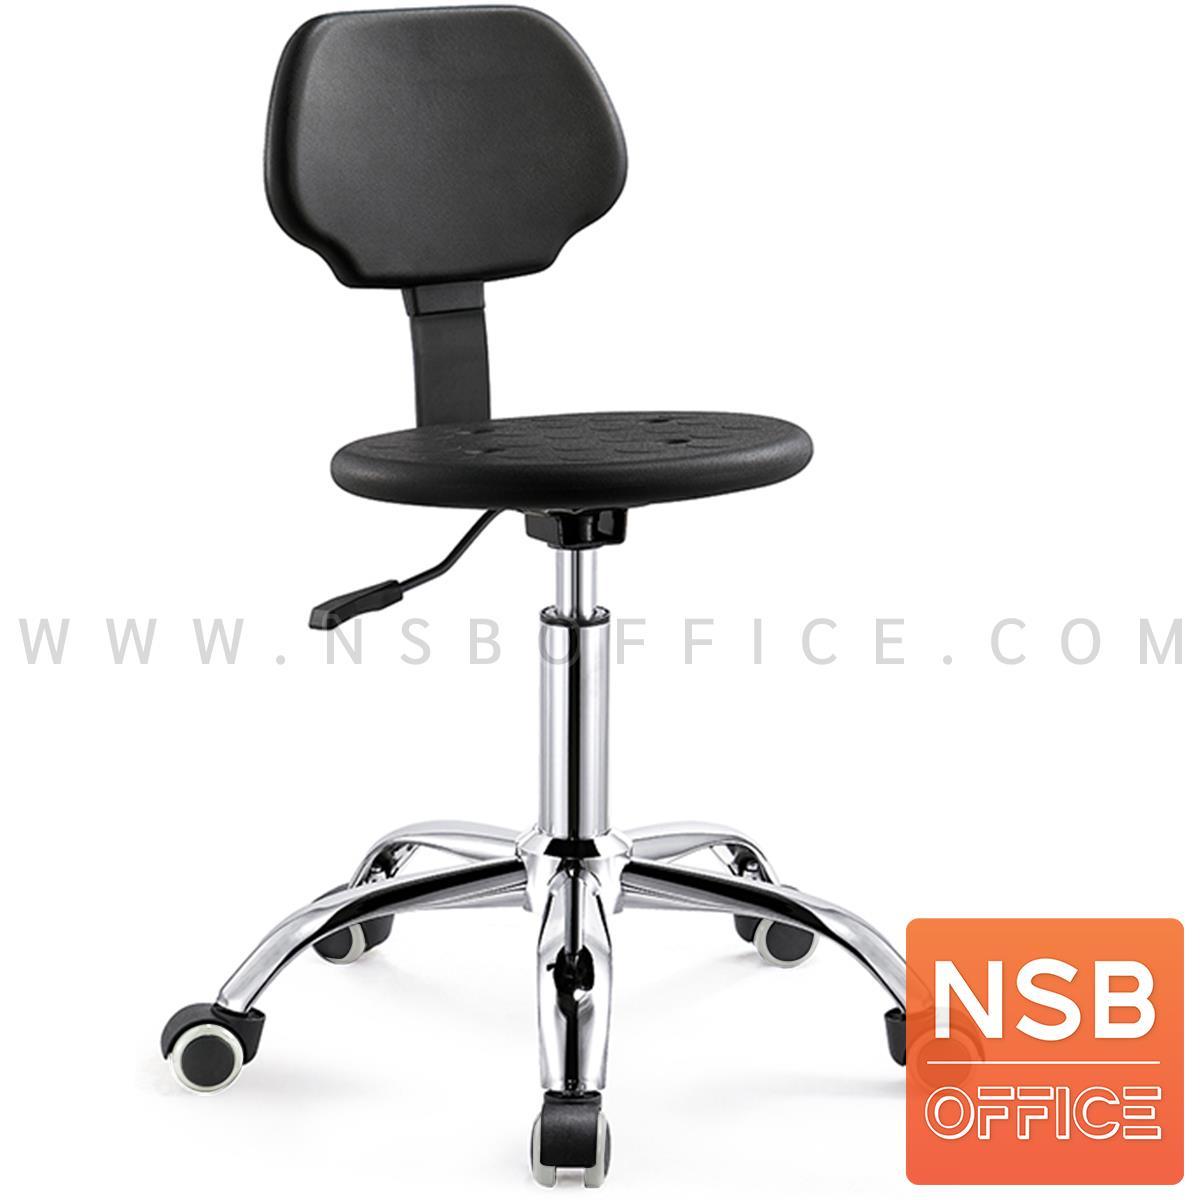 B02A079:เก้าอี้บาร์แล๊บ PU ล้อเลื่อน รุ่น Westron (เวสทรอน)  โช๊คแก๊ส ขาเหล็กชุบโครเมี่ยม